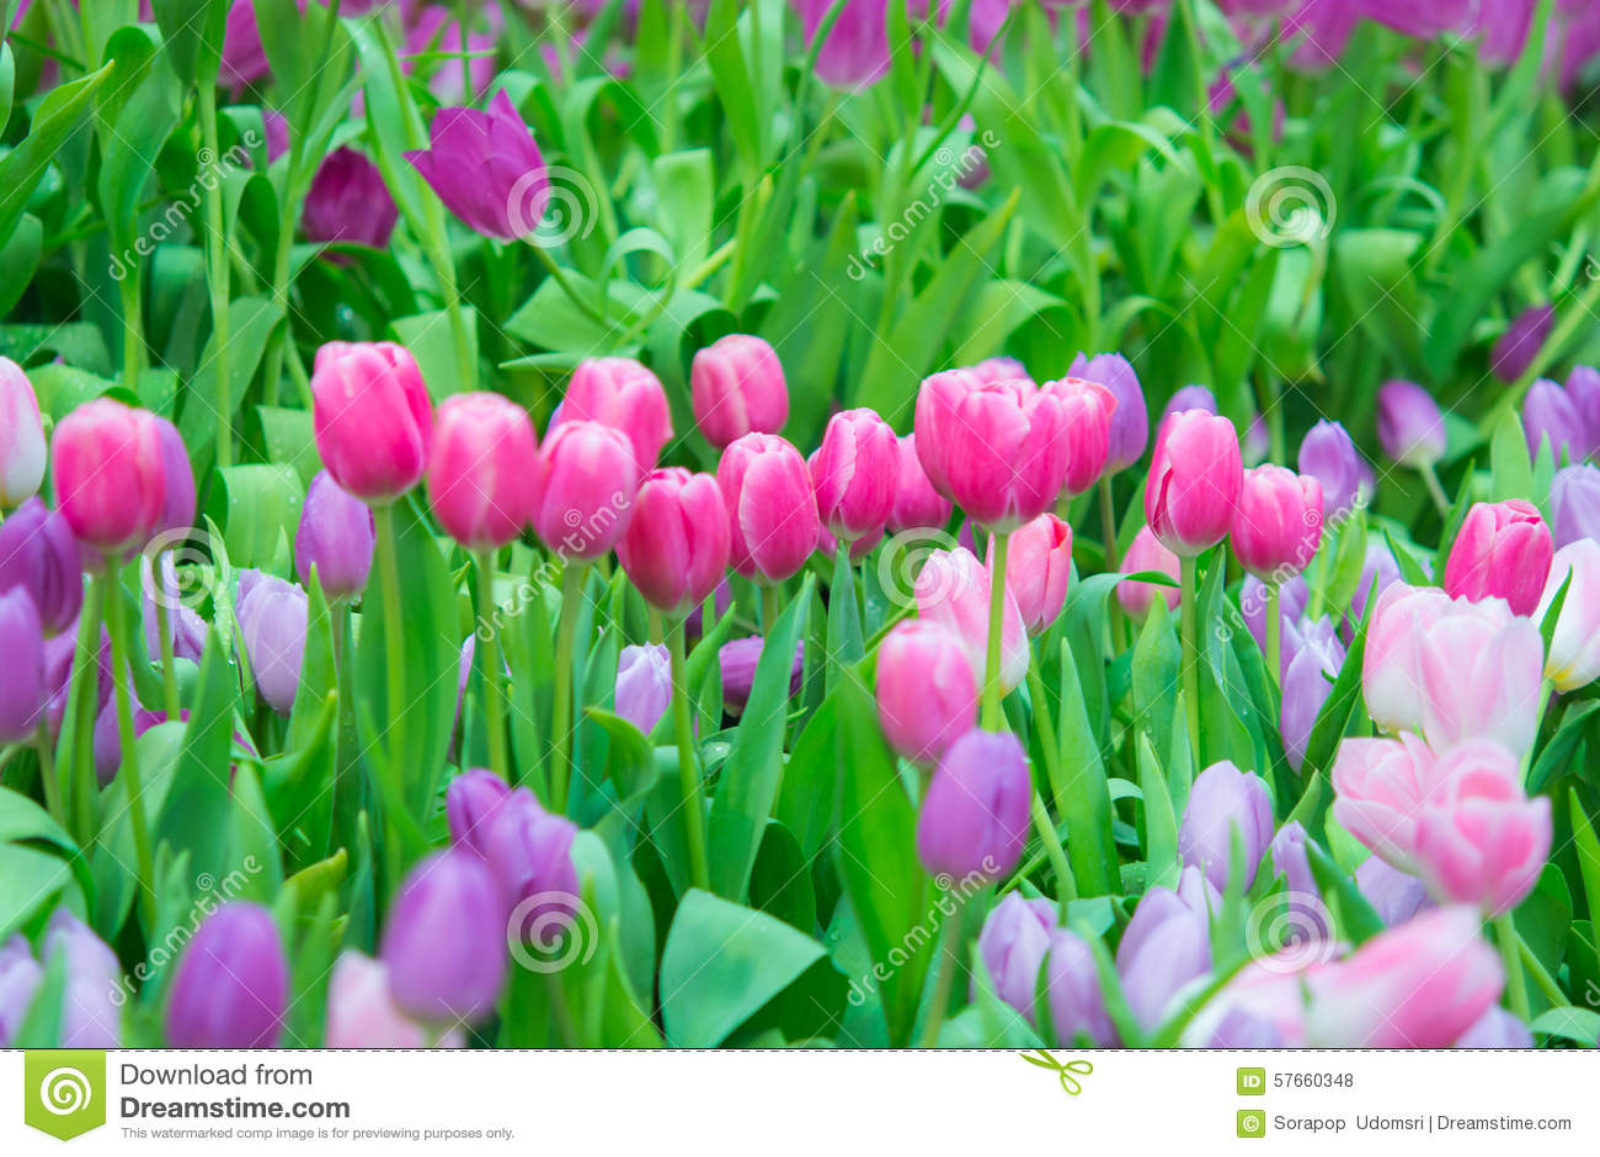 Flor colorida bonita da tulipa